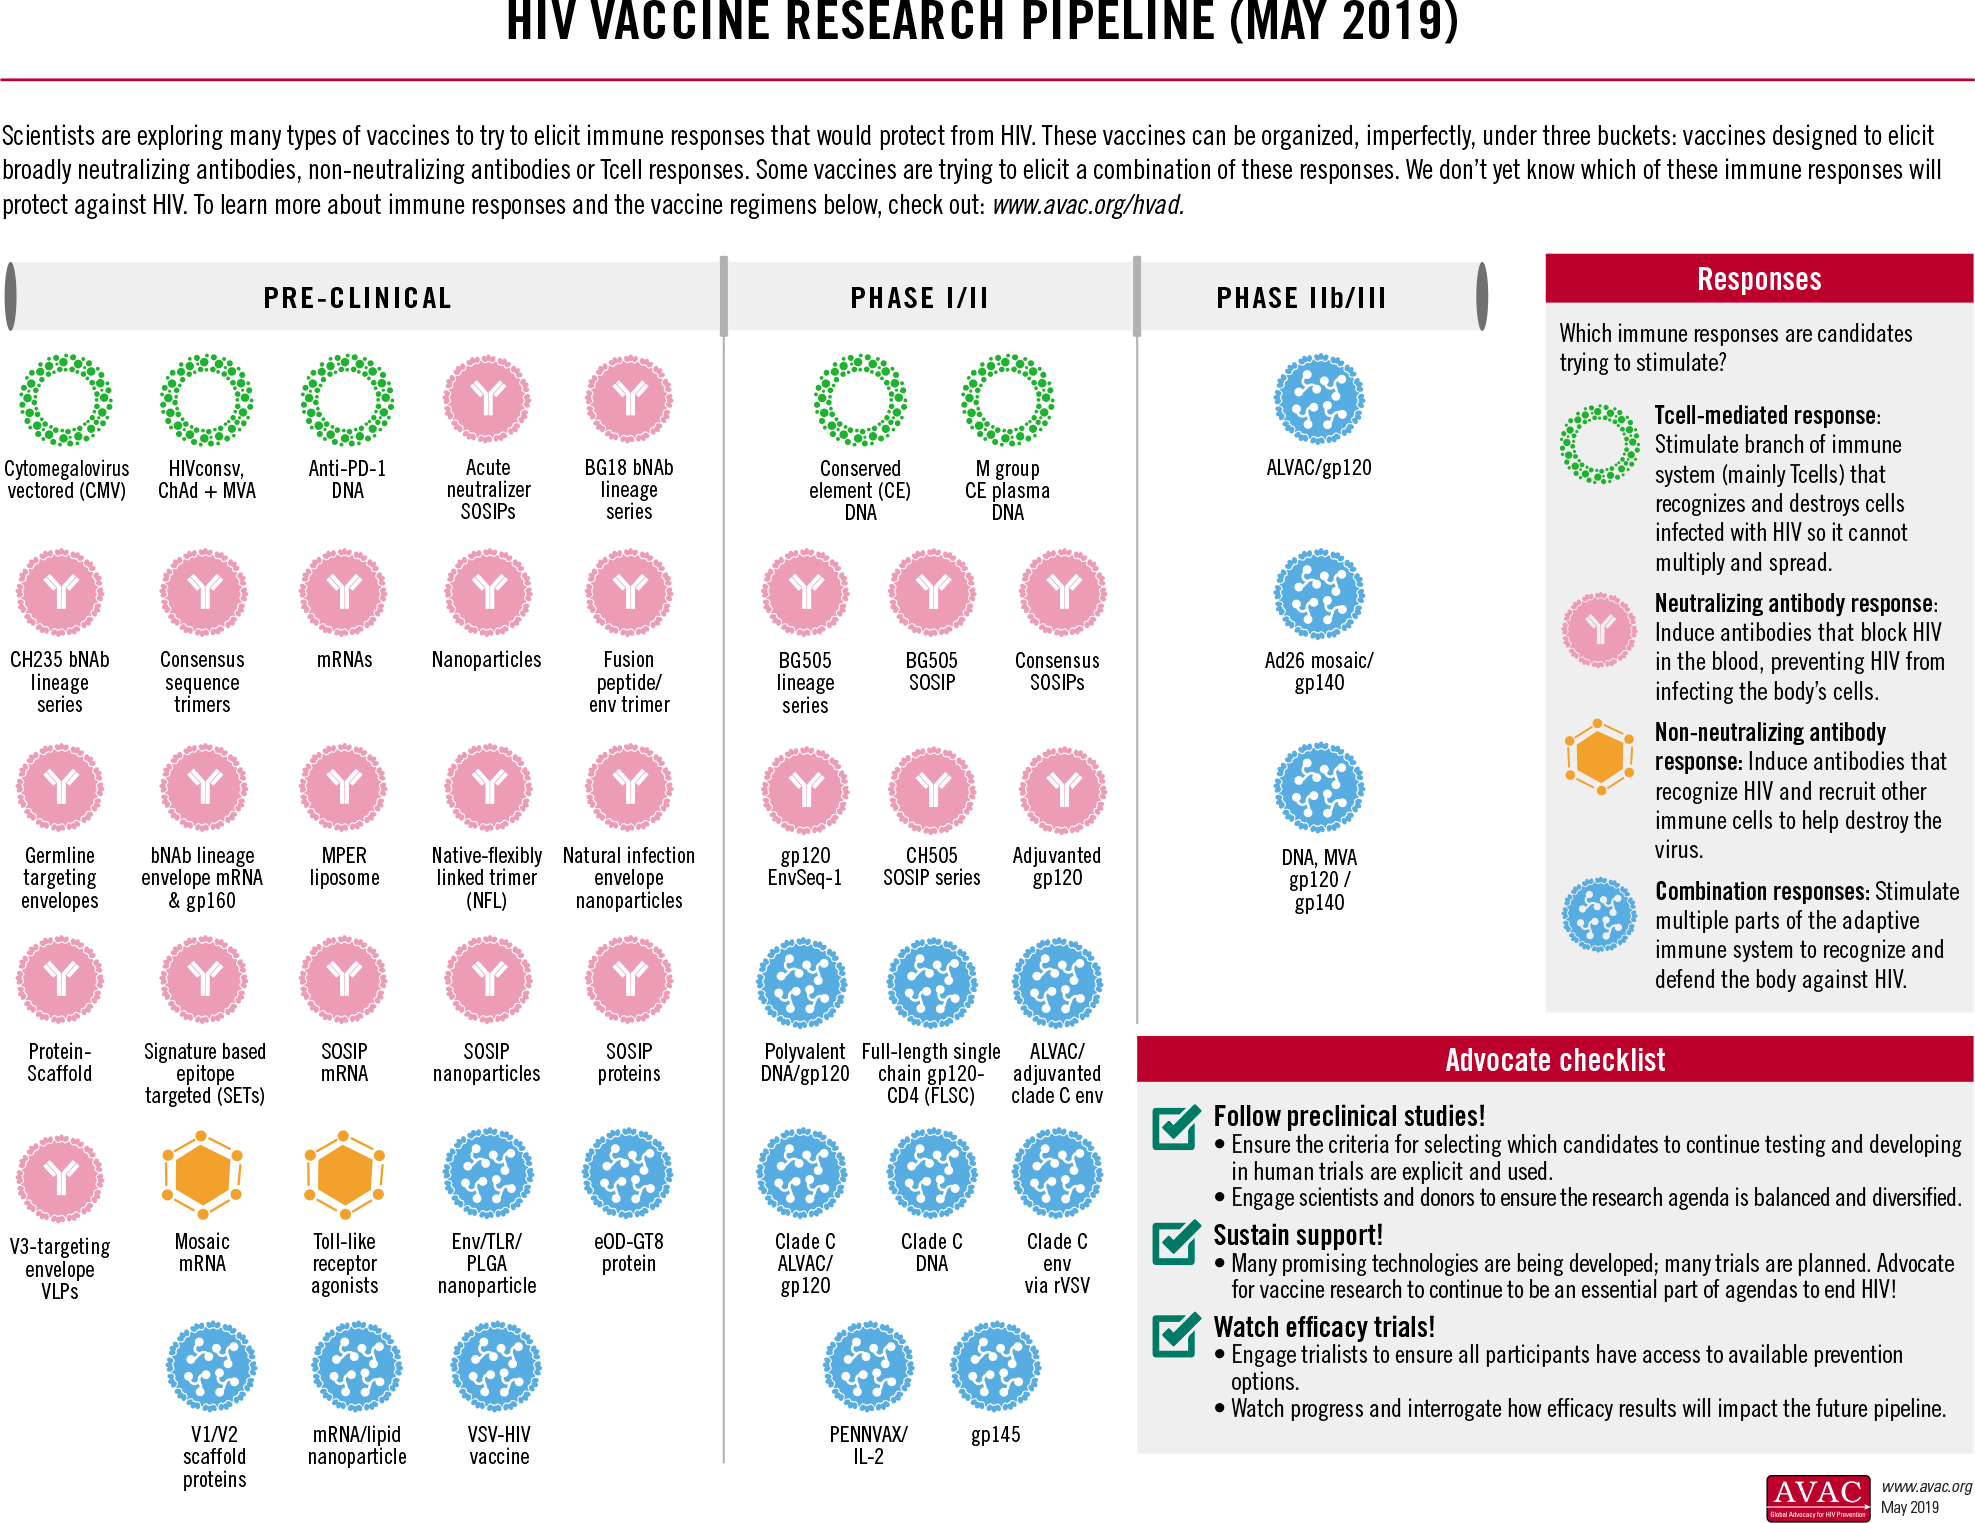 hiv prevention vaccine pipeline 02 - Johnson & Johnson проверит вакцину против ВИЧ среди геев